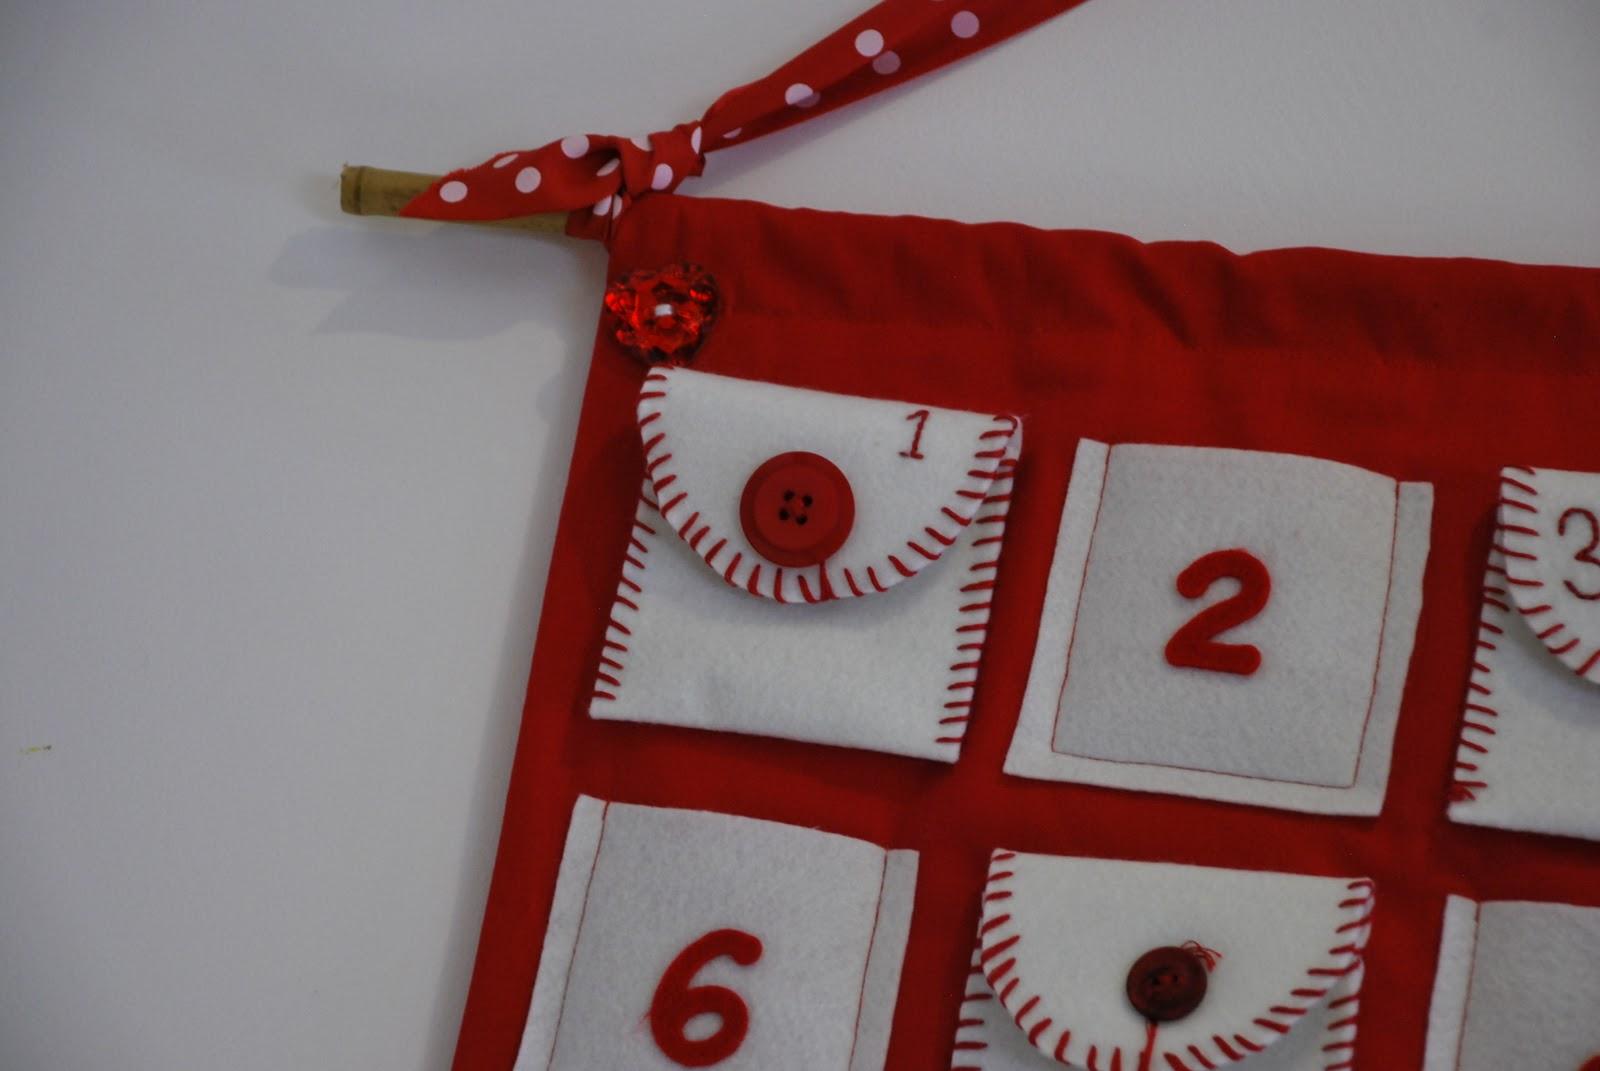 Advent Calendar Handmade Knitting : Children clothes crafts and conversation handcrafted